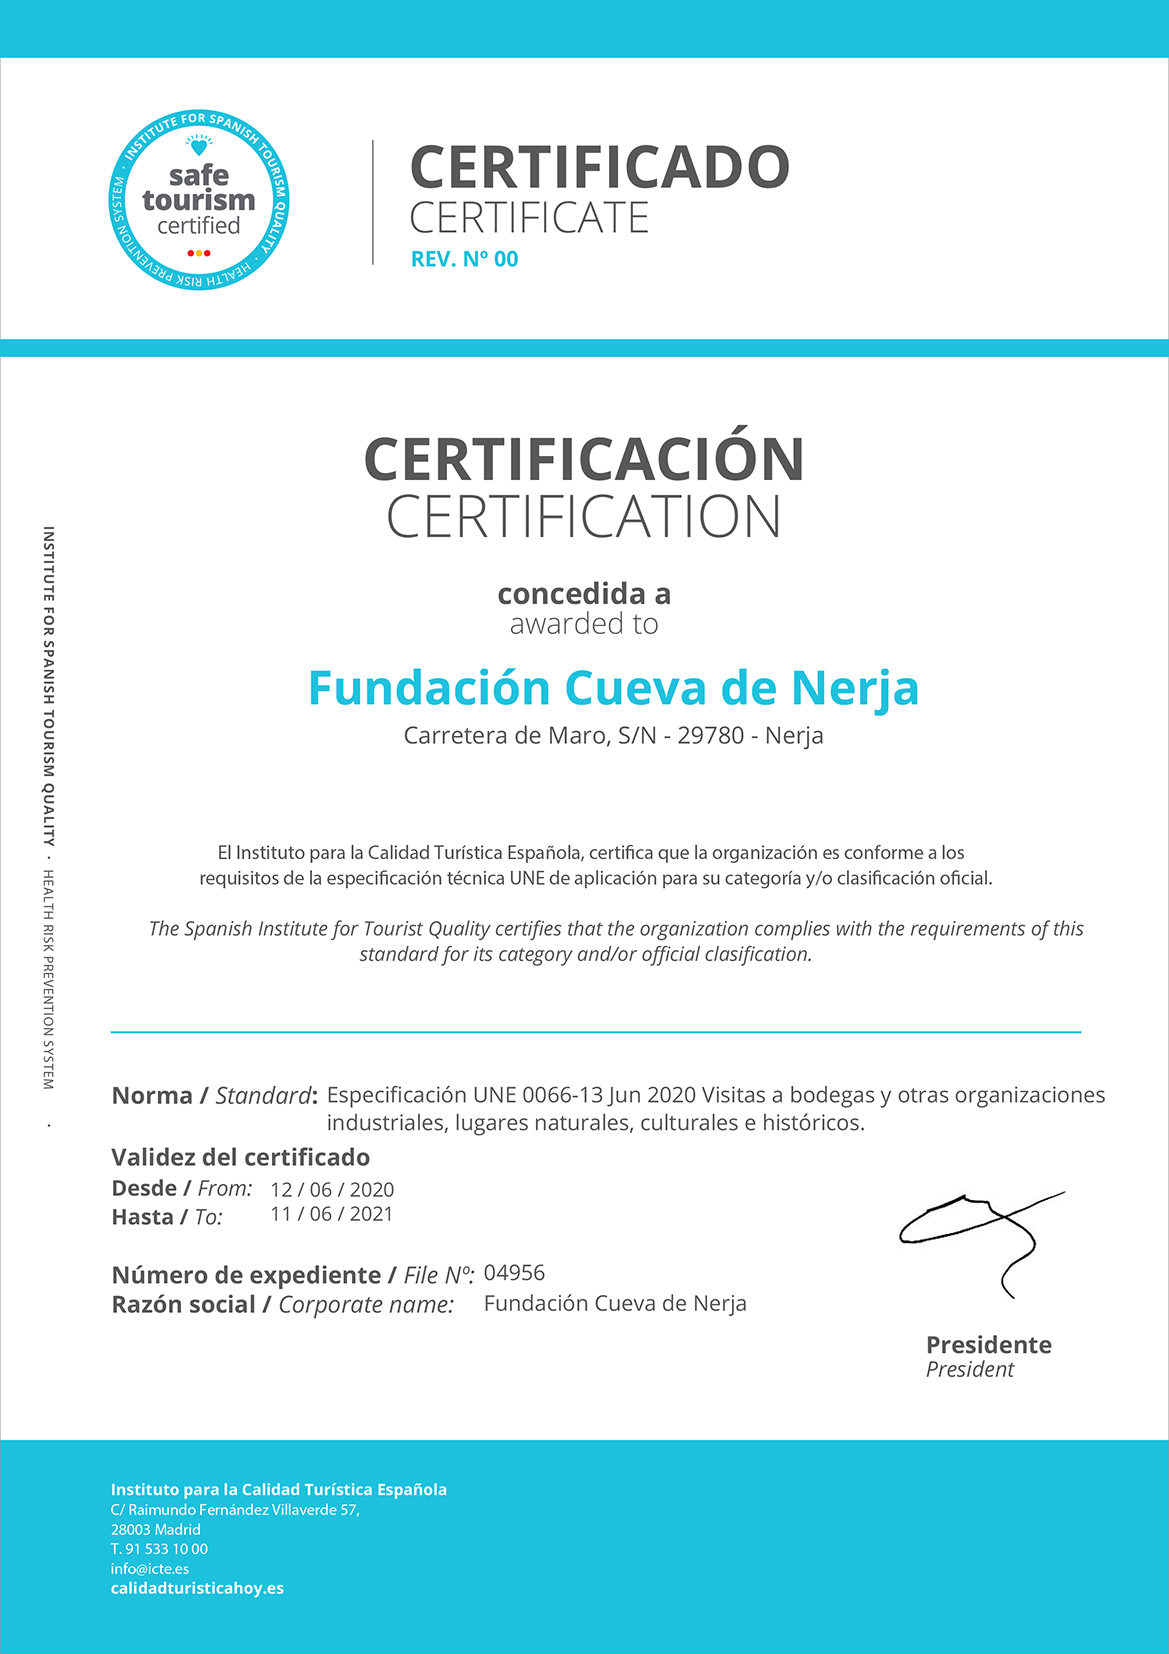 Turismo Seguro - Safe Tourism Certified